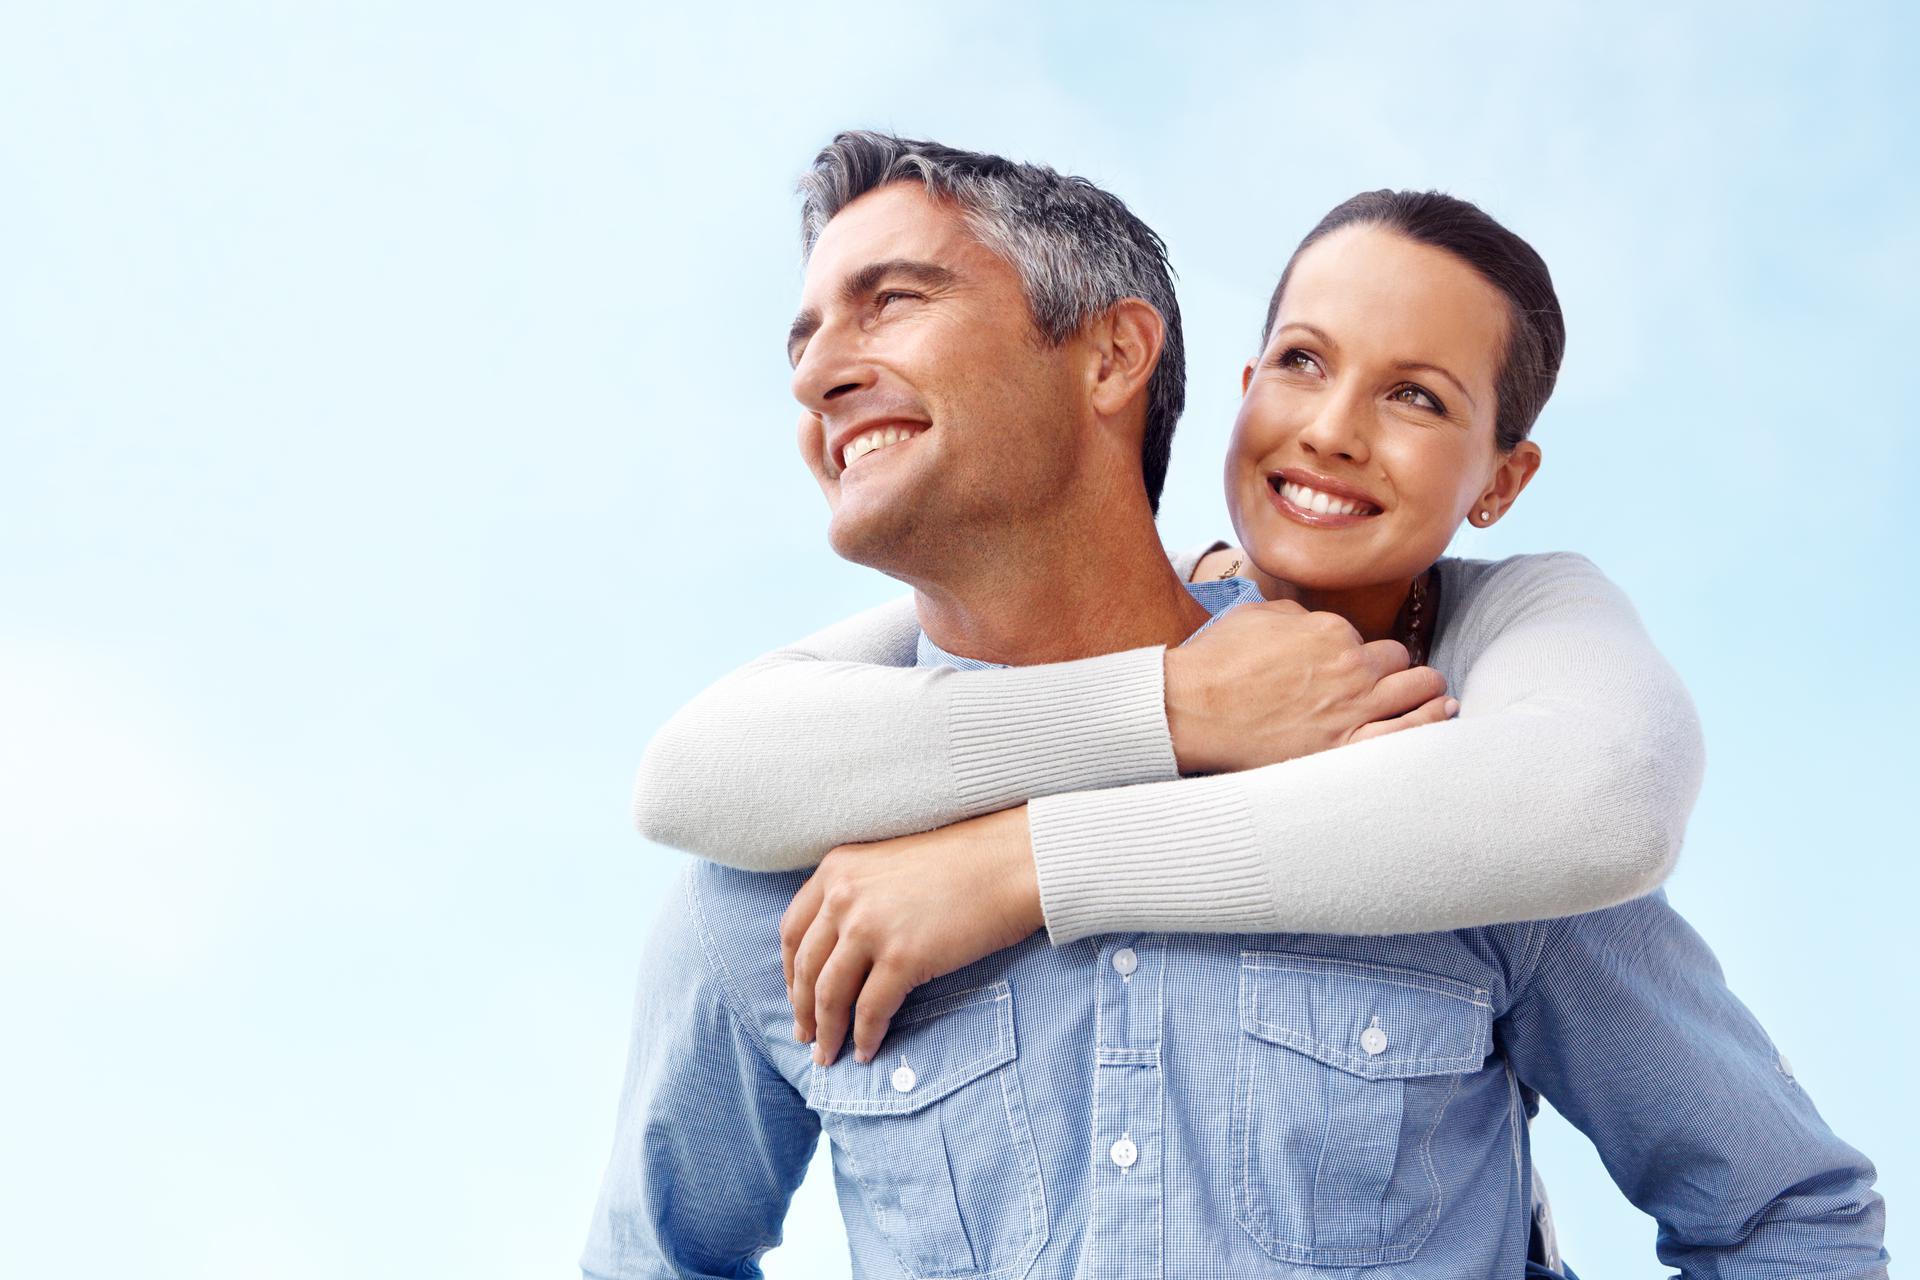 The Aesthetic Medicine & Anti-Aging Clincis